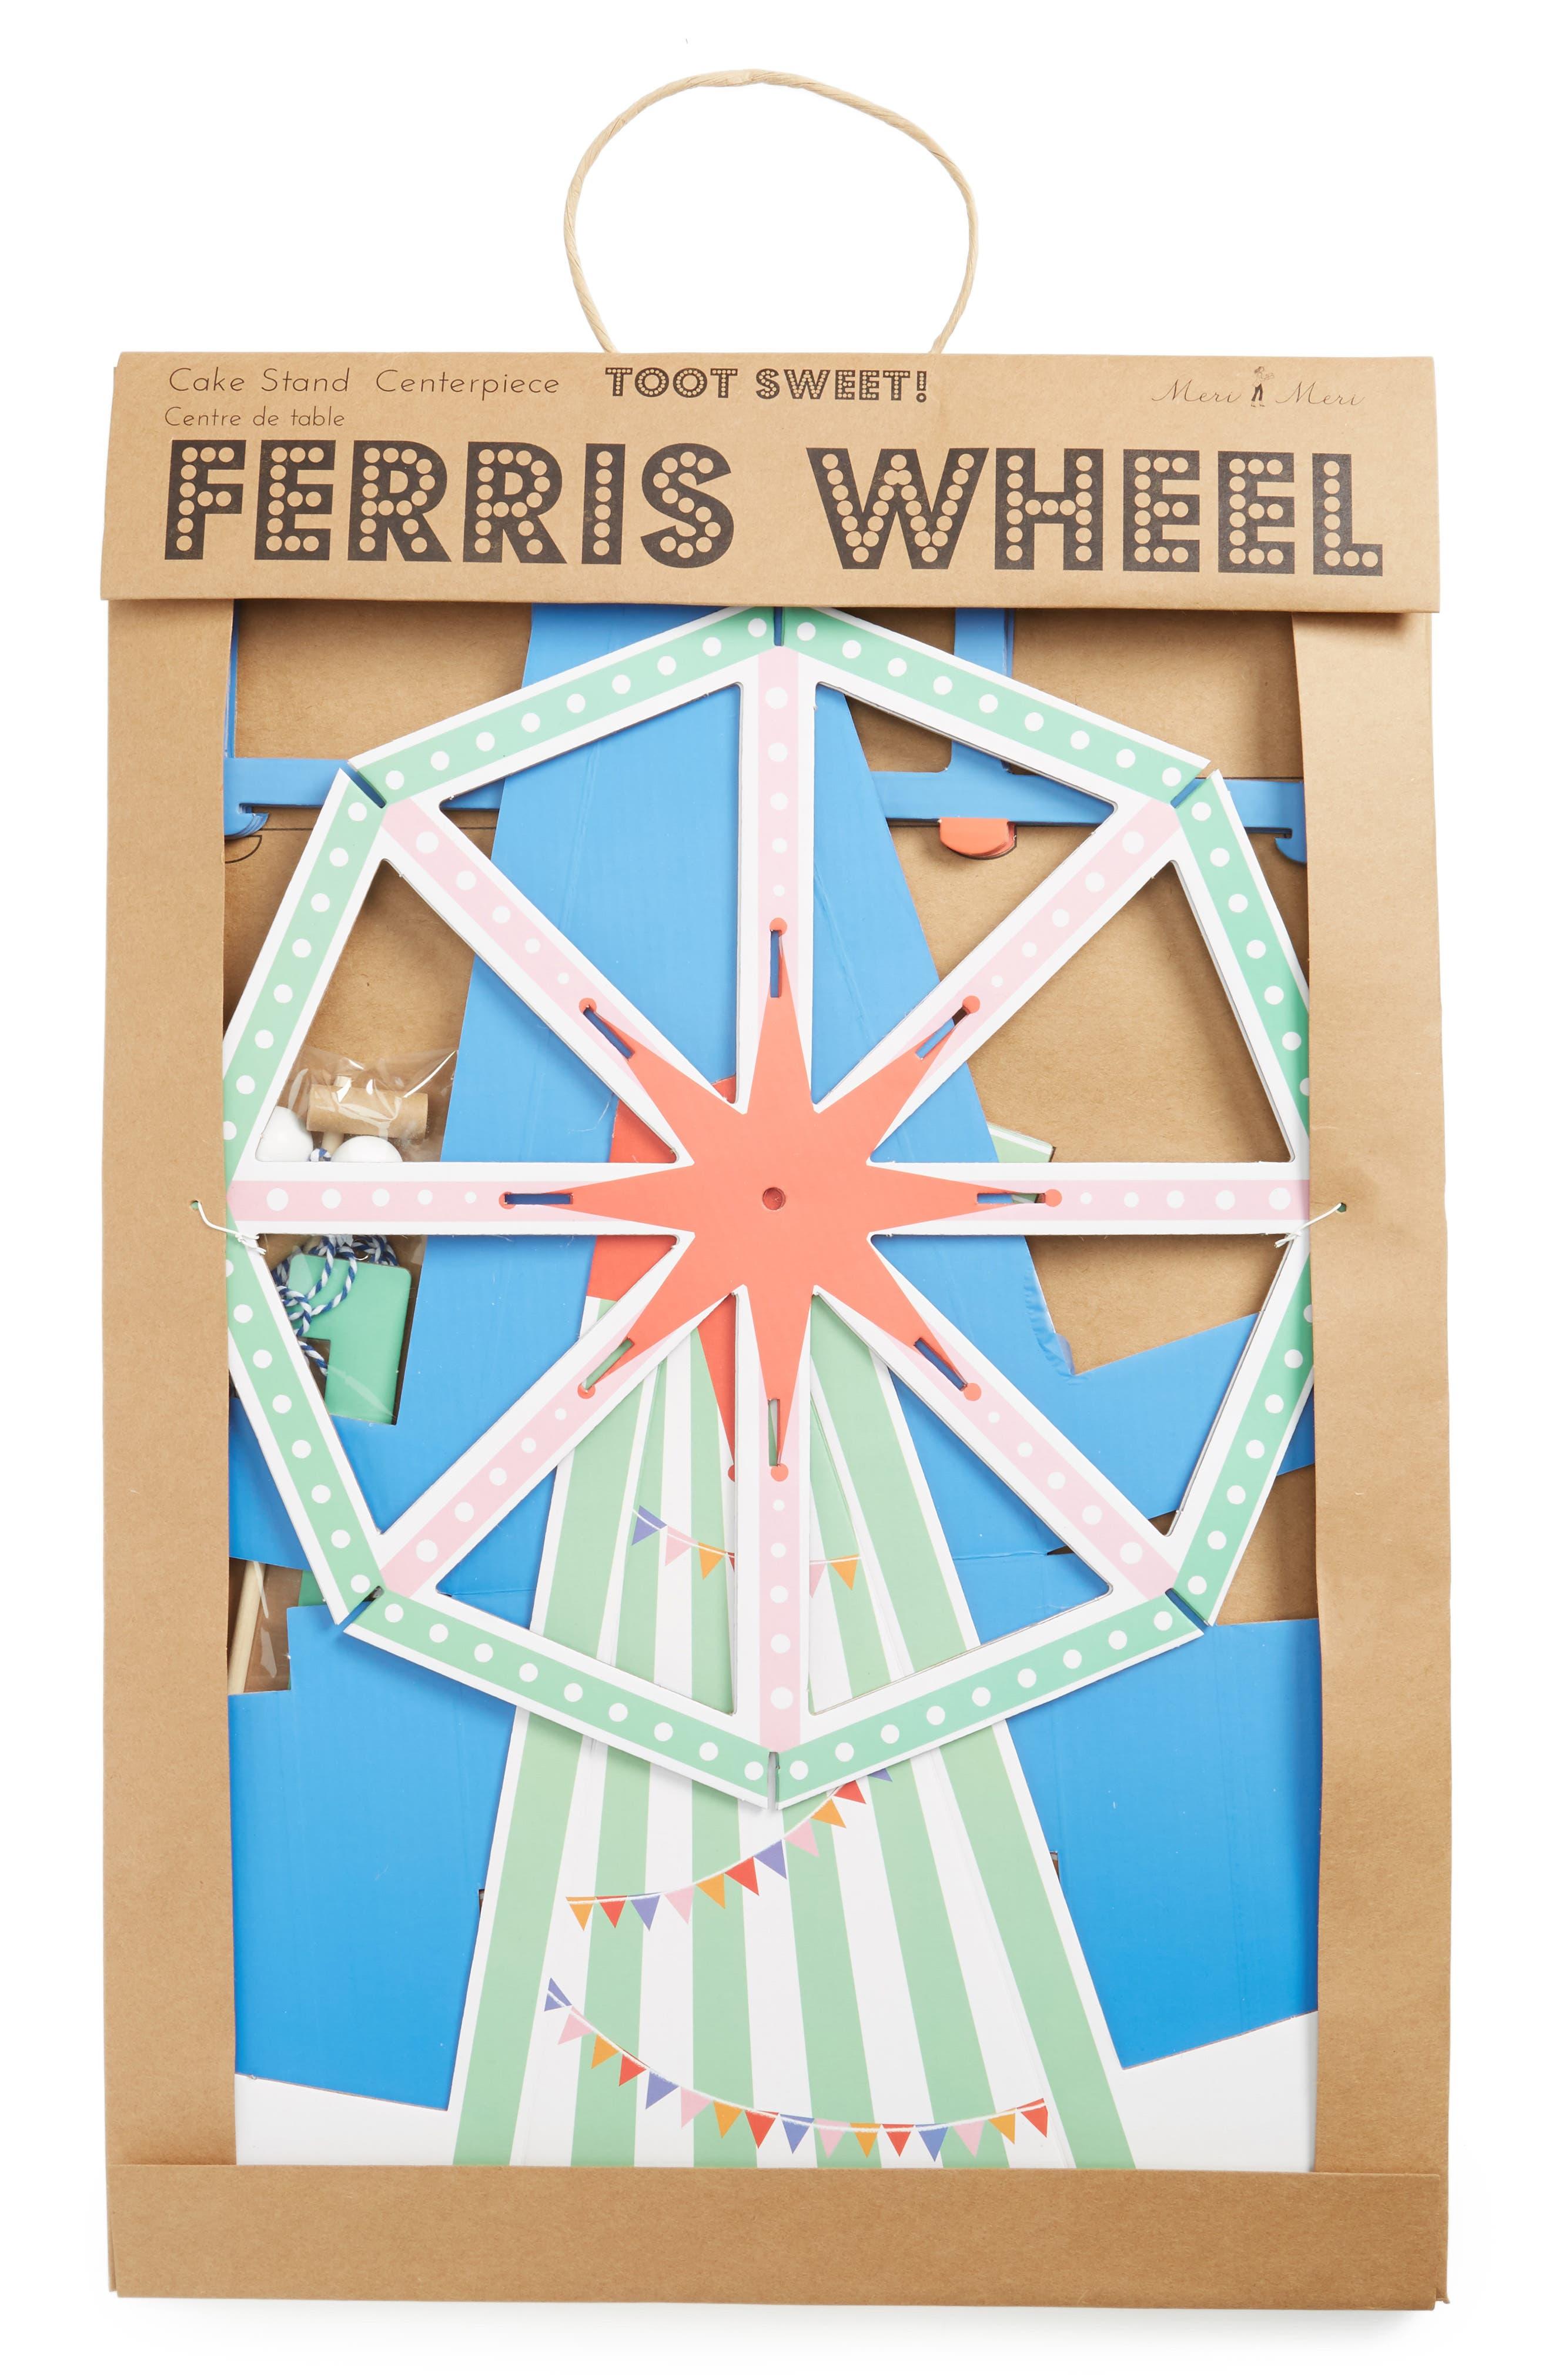 Main Image - Meri Meri Toot Sweet - Ferris Wheel Cupcake Centerpiece